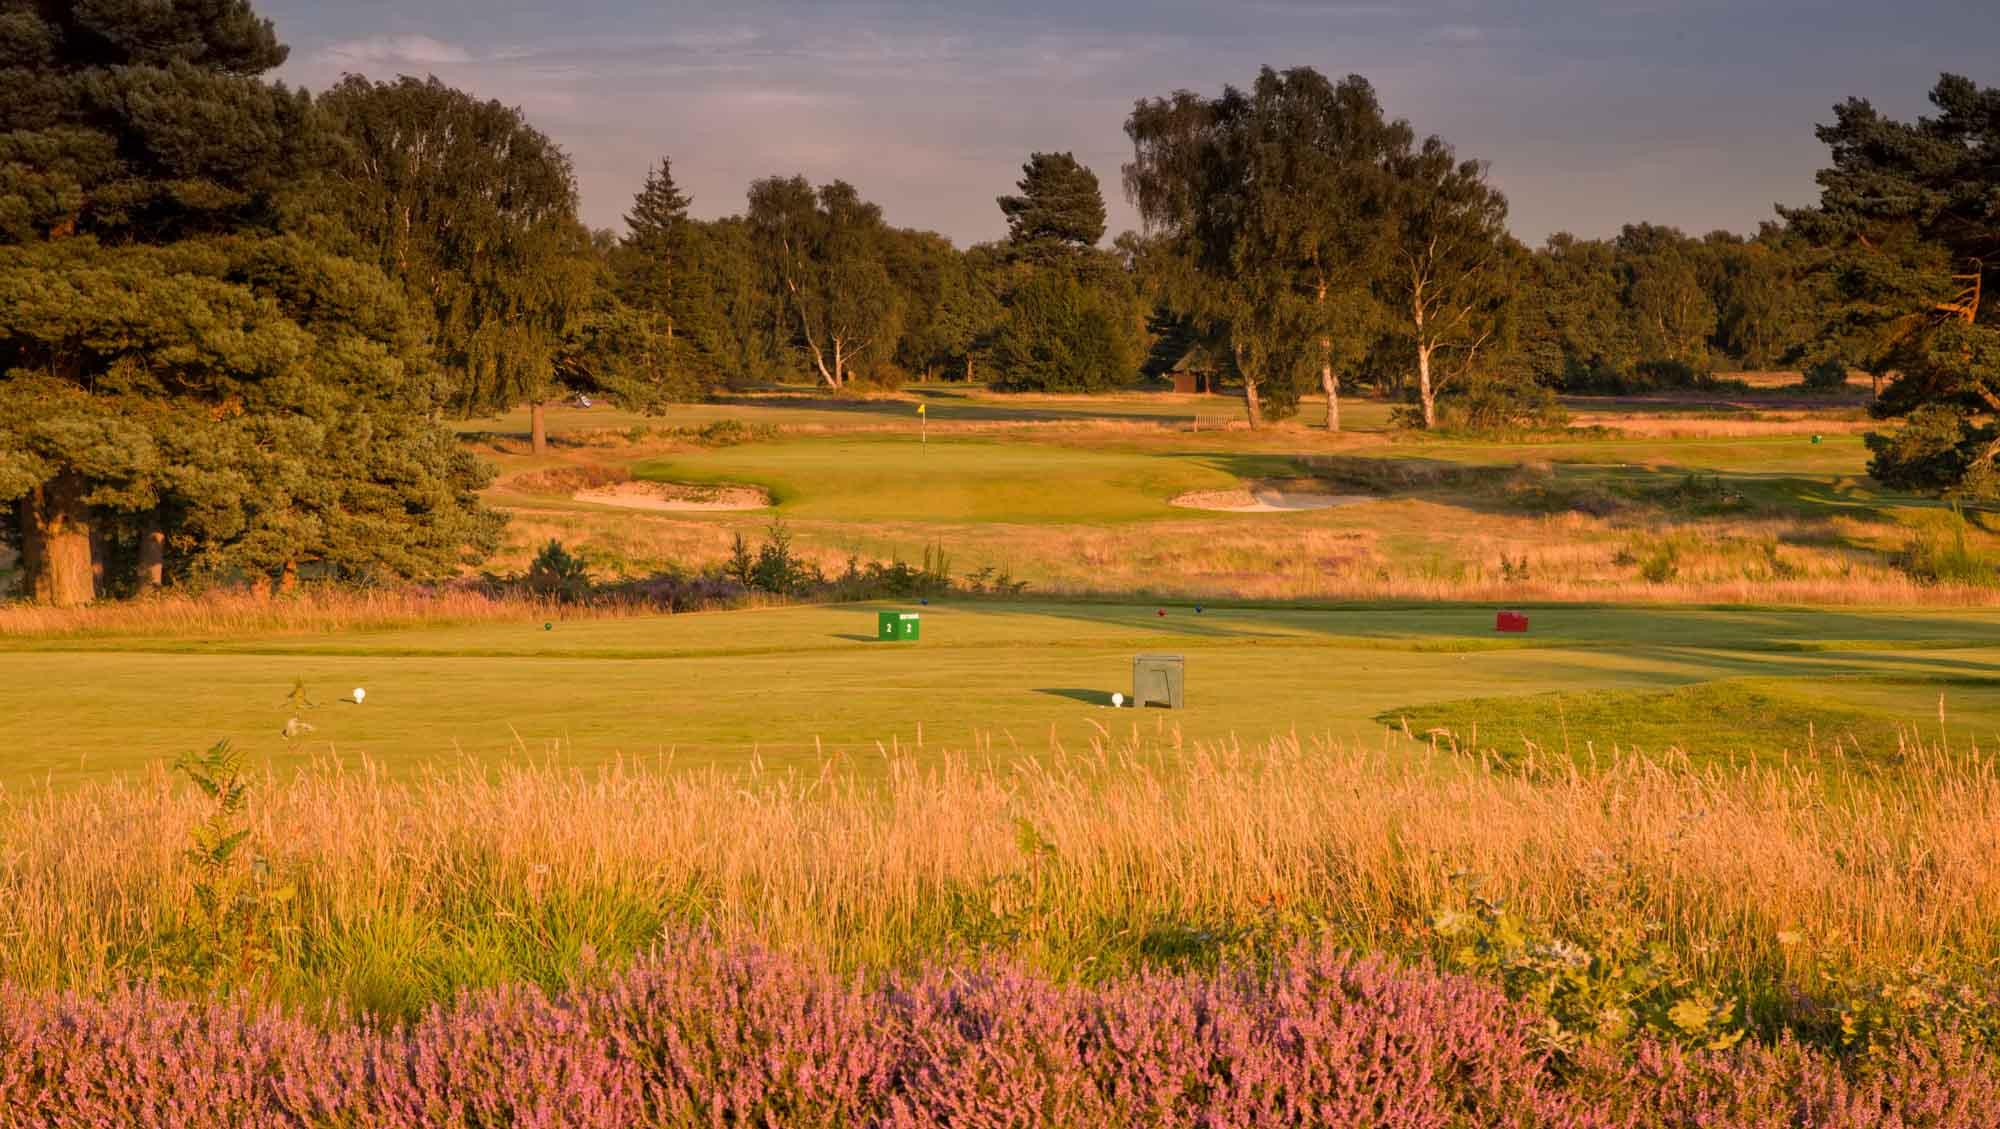 A photo of the 17th hole at Walton Heath Old Course.